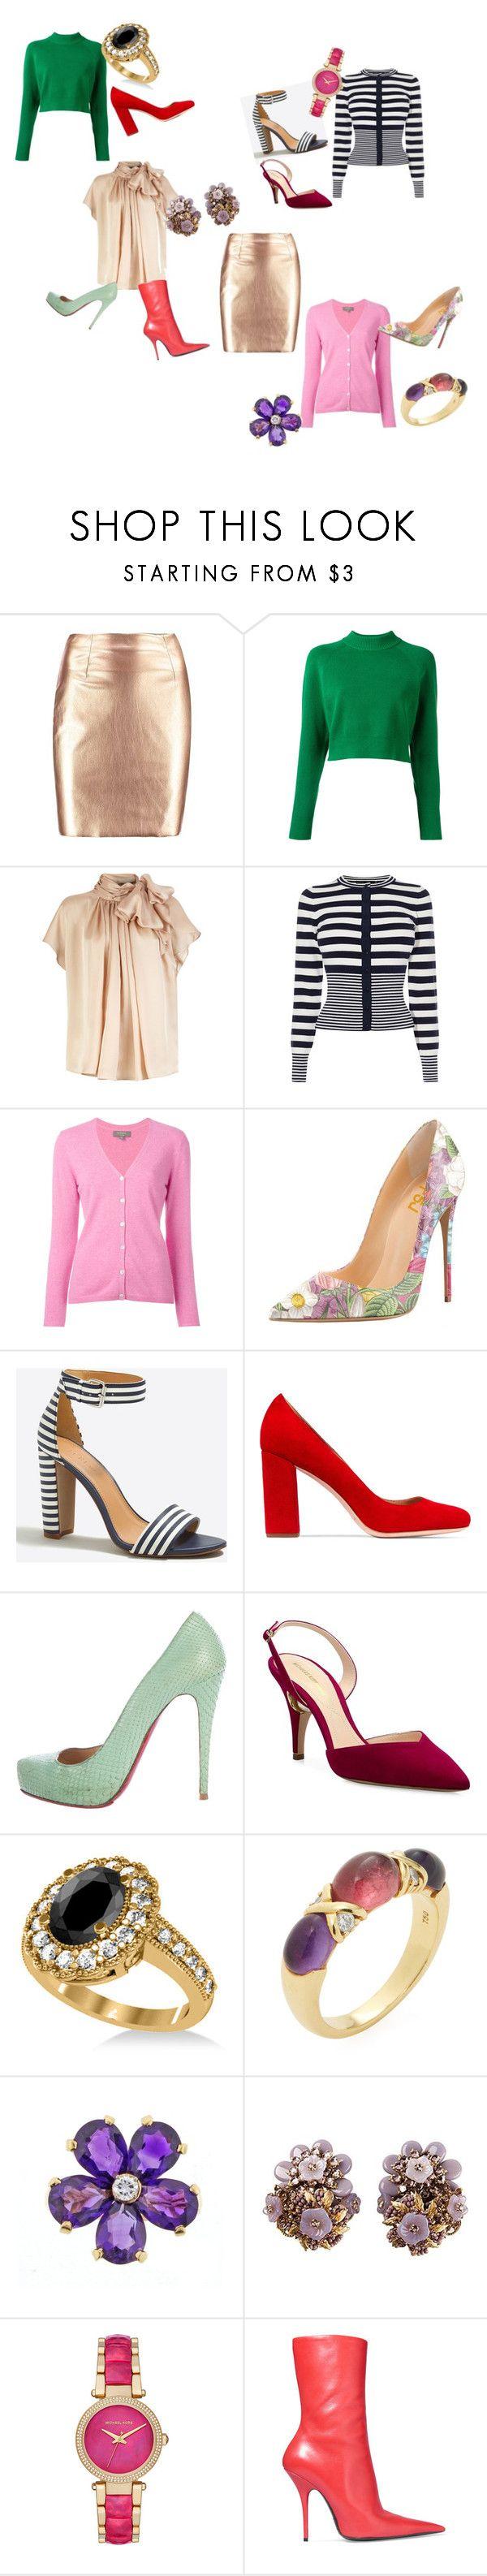 """gonna"" by anna-esenova on Polyvore featuring moda, DKNY, Karen Millen, N.Peal, J.Crew, Loeffler Randall, Christian Louboutin, Nicholas Kirkwood, Allurez e Tiffany & Co."